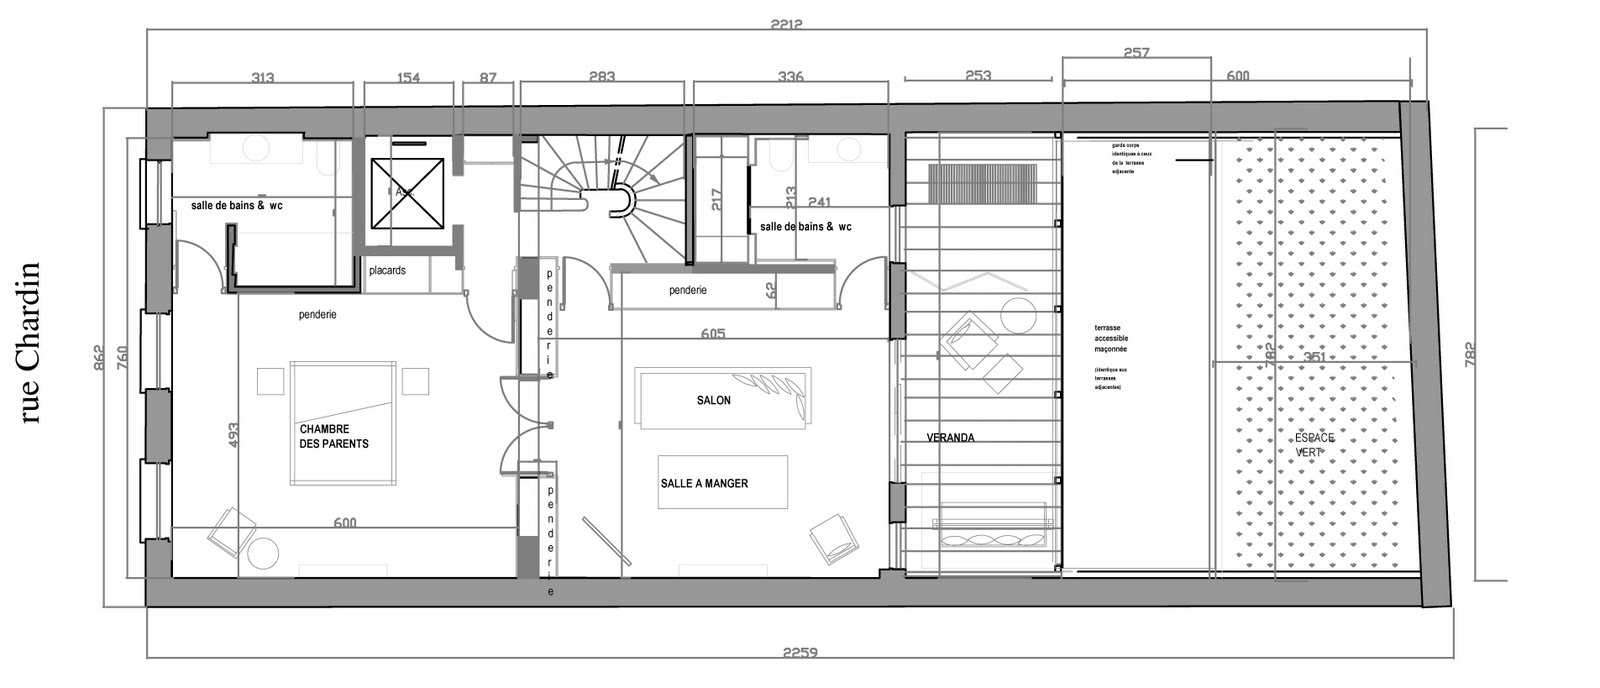 atelier d 39 architecture castellani 01 09 10. Black Bedroom Furniture Sets. Home Design Ideas